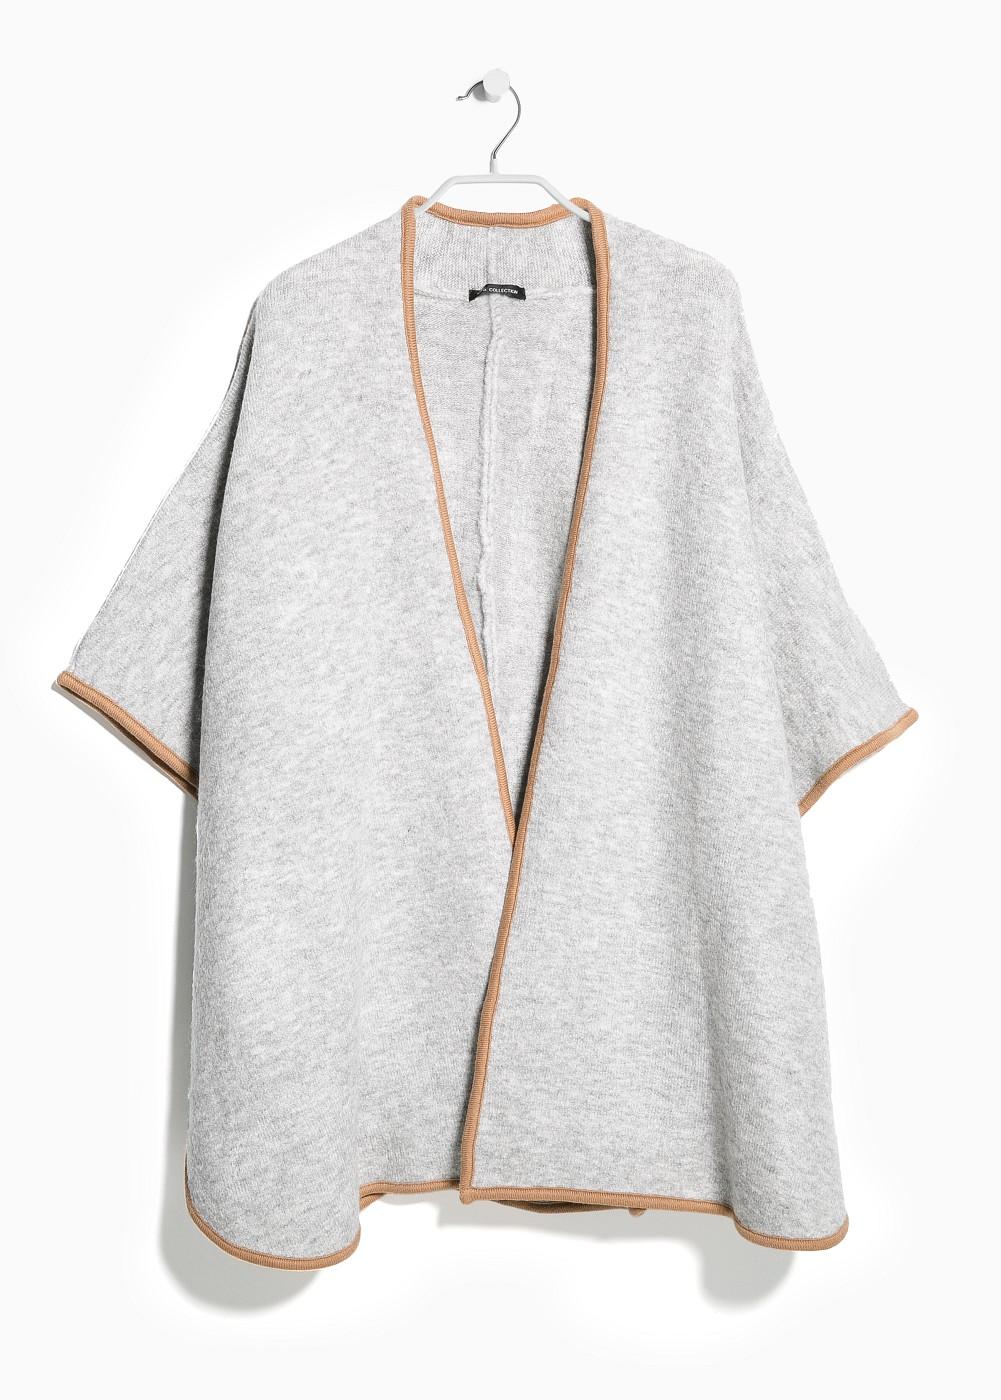 http://shop.mango.com/GB/p0/women/clothing/cardigans-and-sweaters/cardigans/trim-knit-cape/?id=33087603_37&n=1&s=prendas.cardigans&ident=0__0_1415568012196&ts=1415568012196